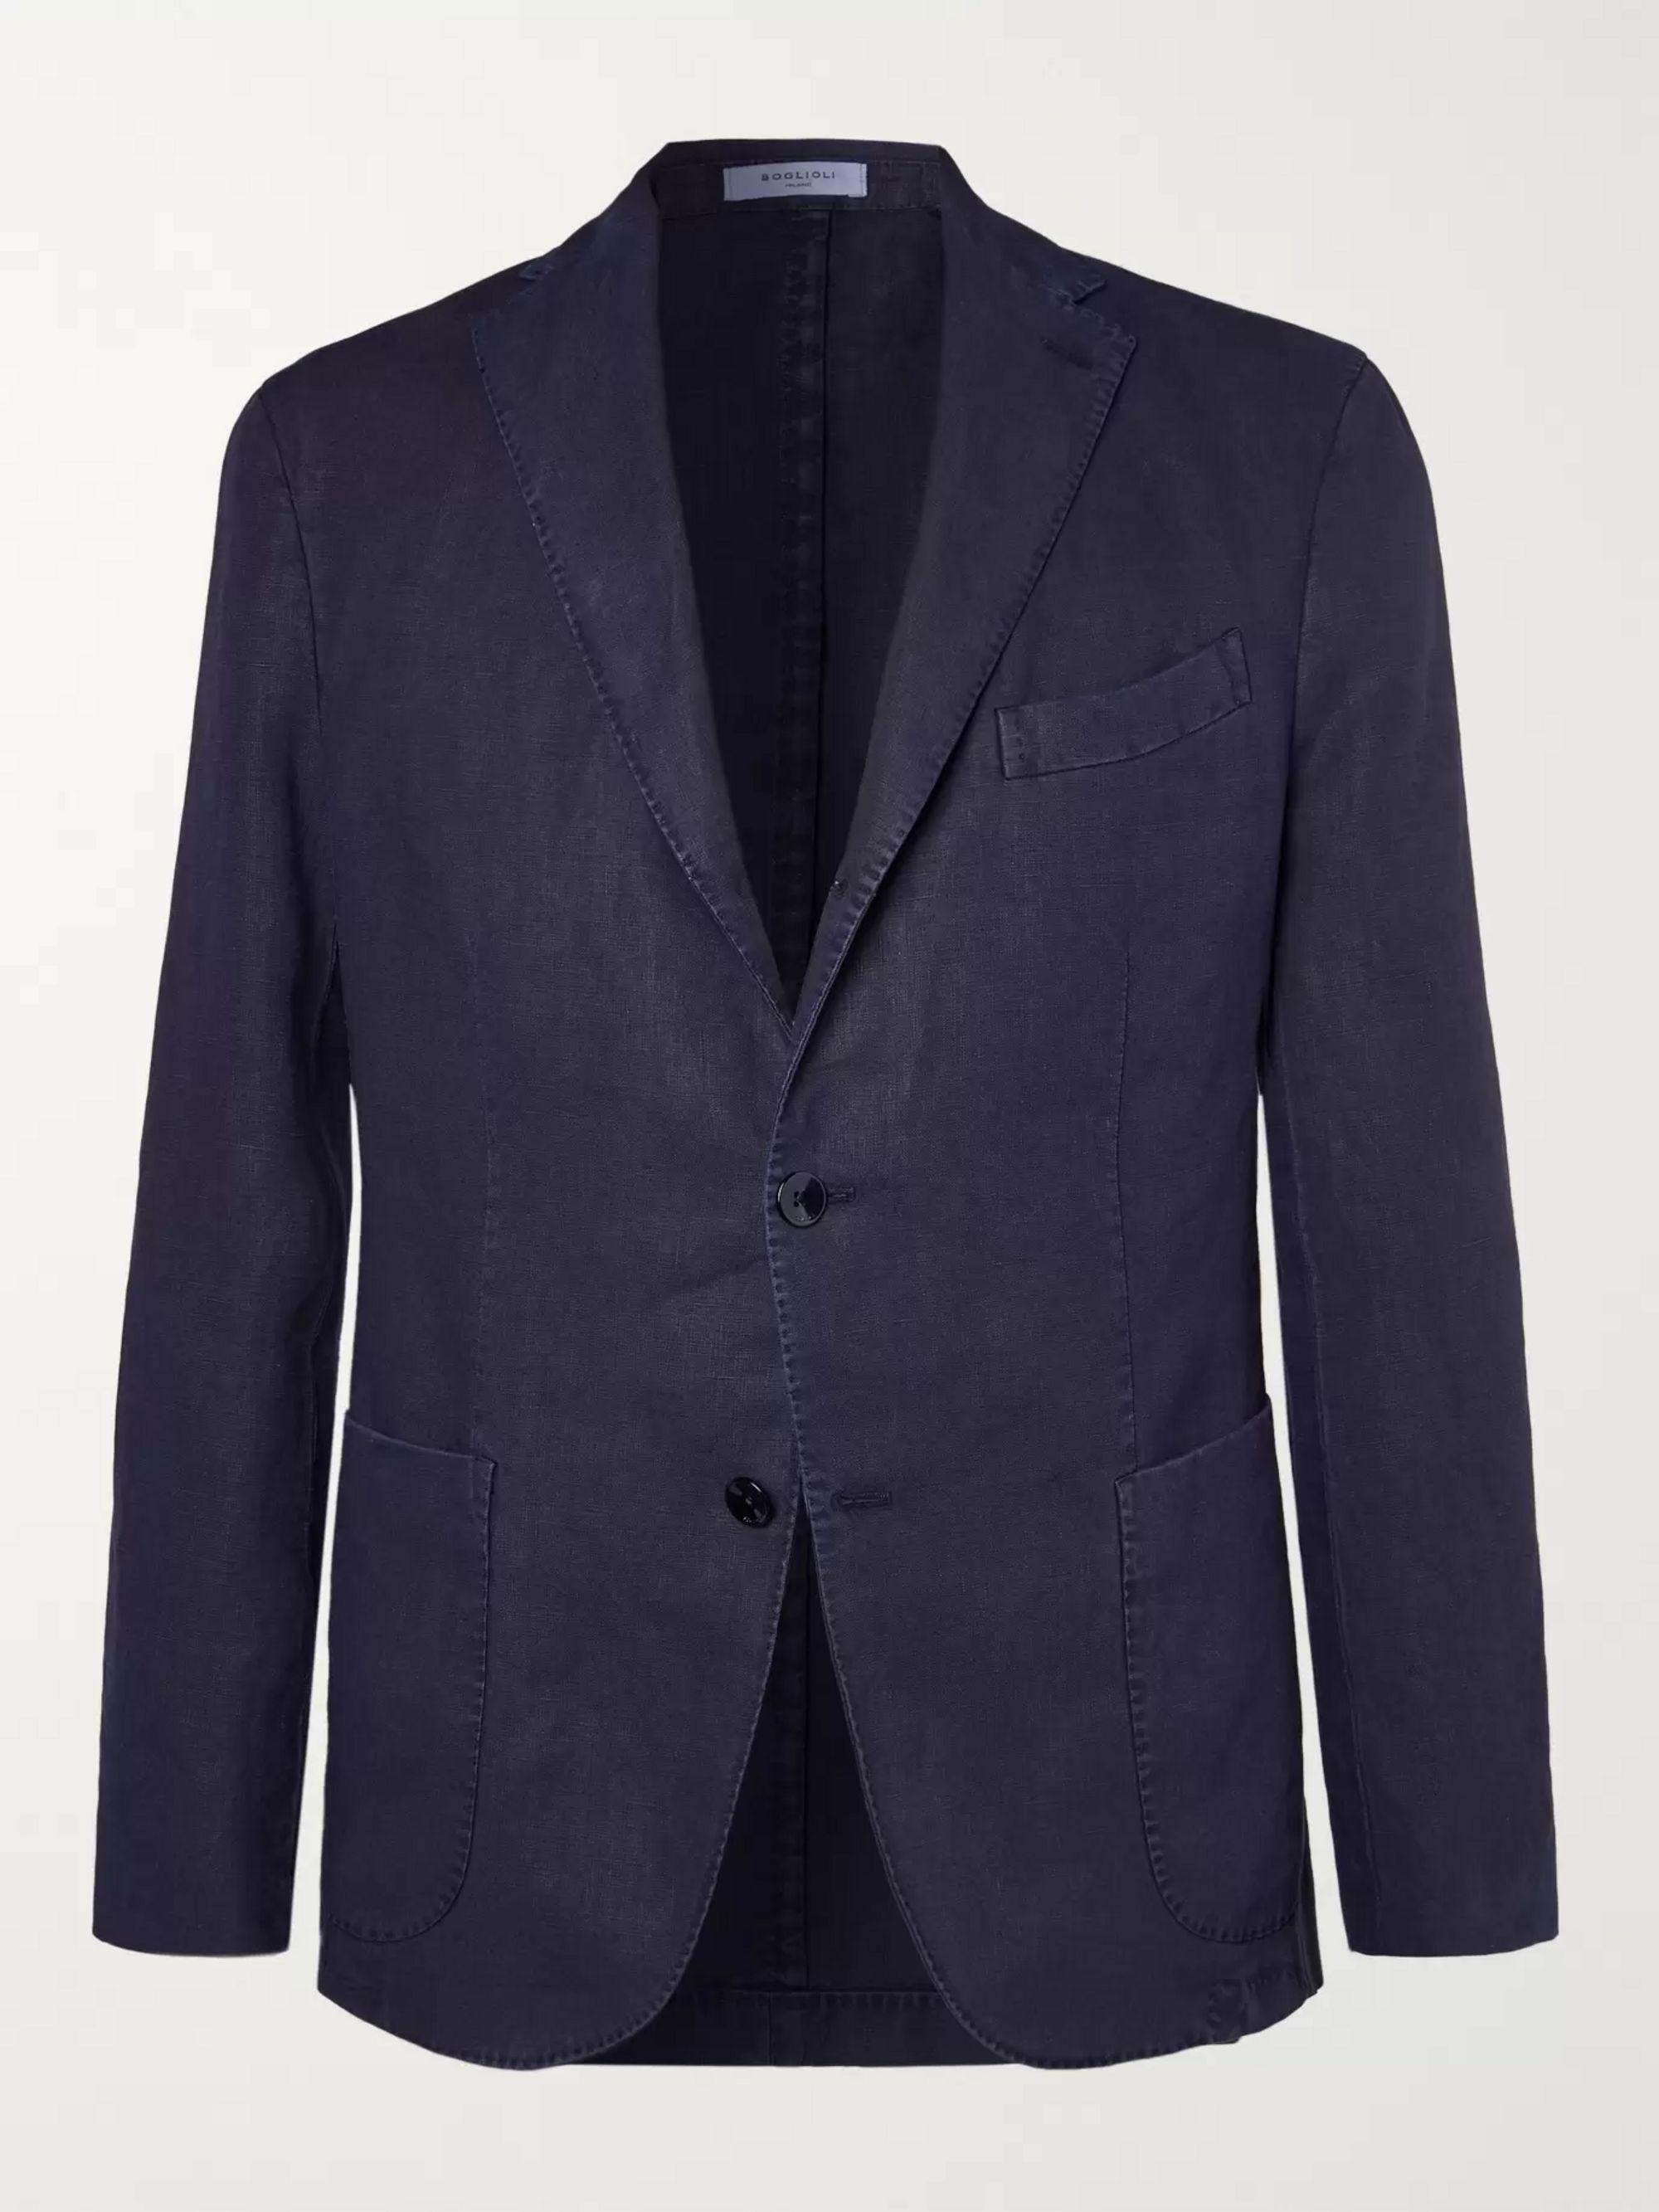 Green K Jacket Slim Fit Unstructured Linen Suit Jacket